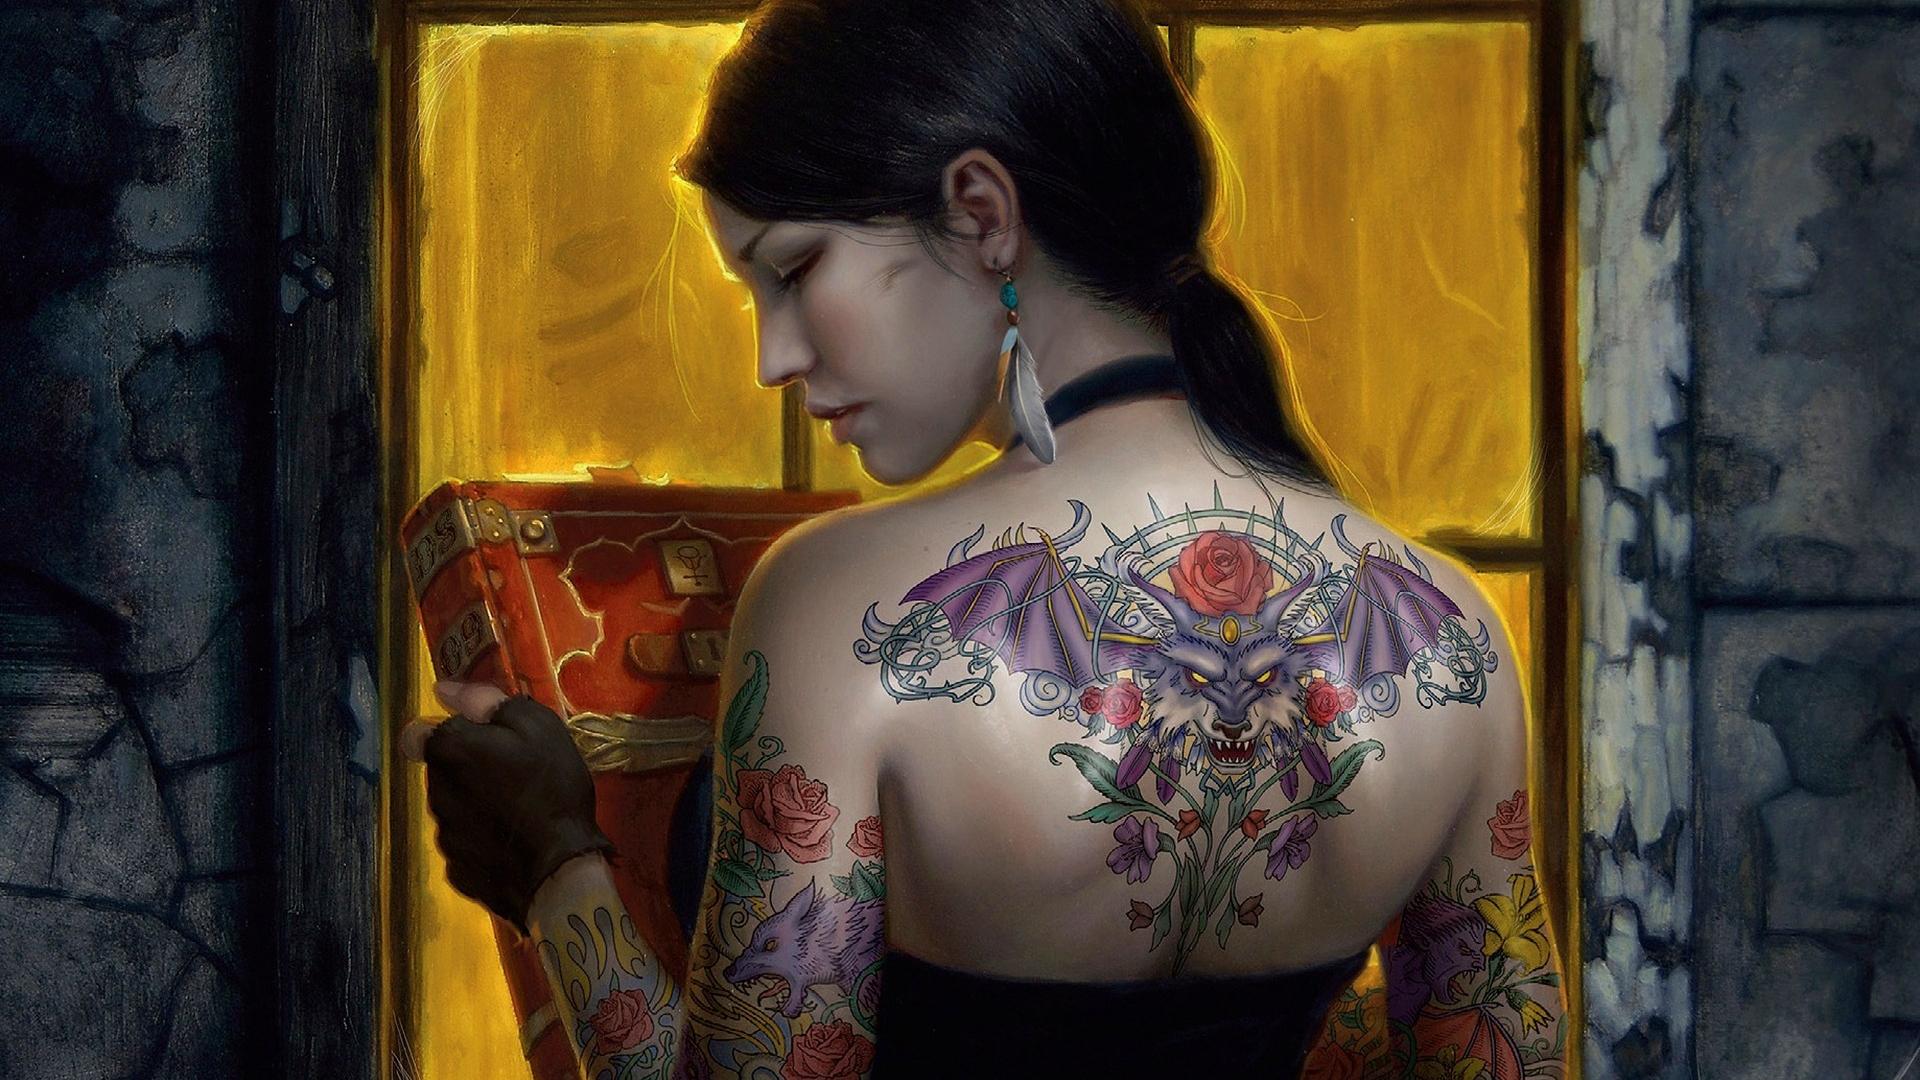 Tattoo Computer Wallpapers, Desktop Backgrounds